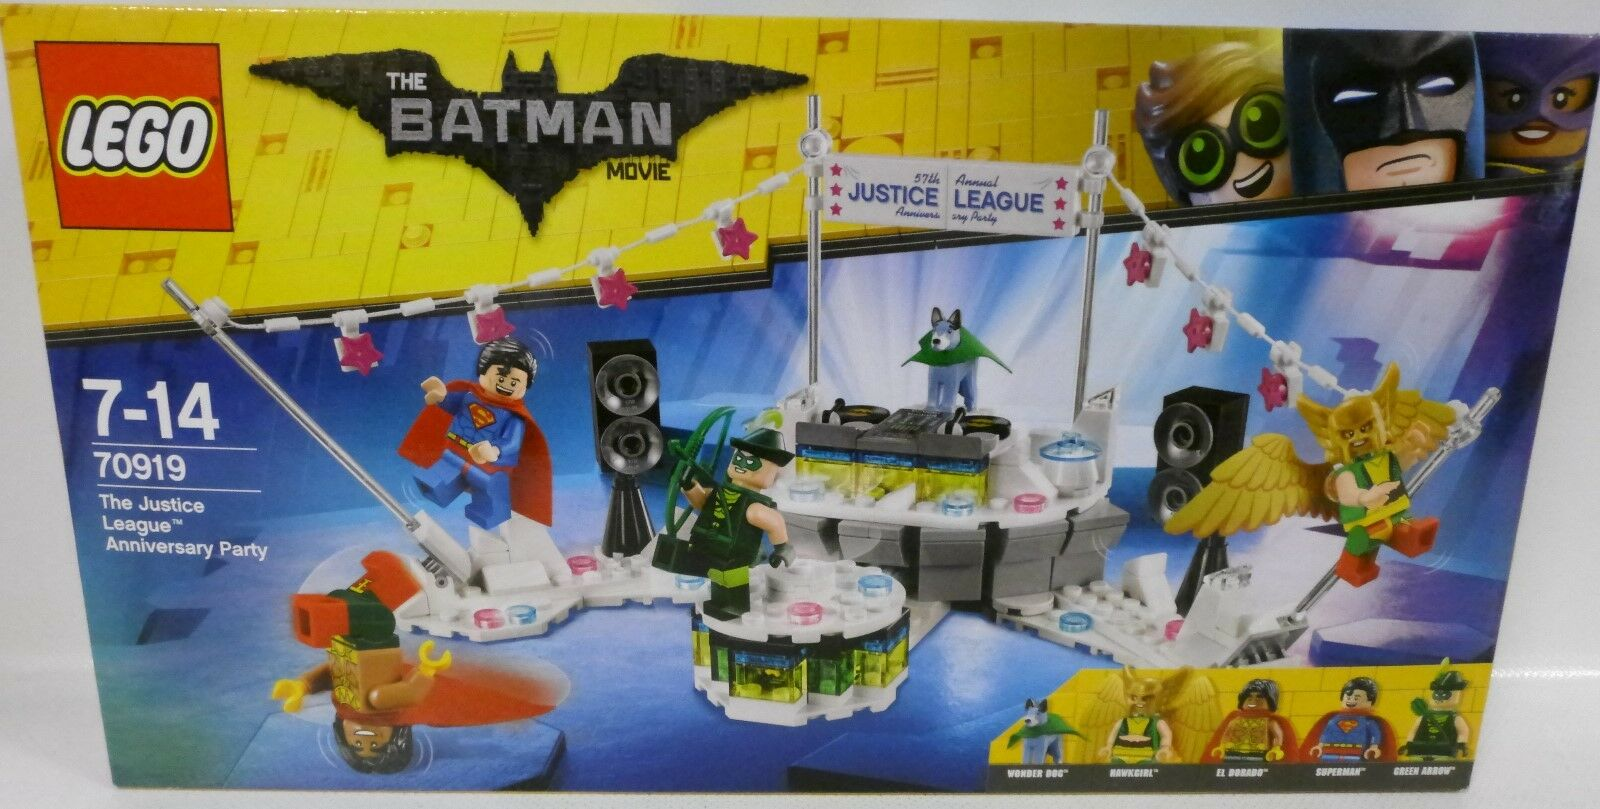 NEU LEGO® 70919 THE BATMAN MOVIE The Justice League Anniversary Party OVP